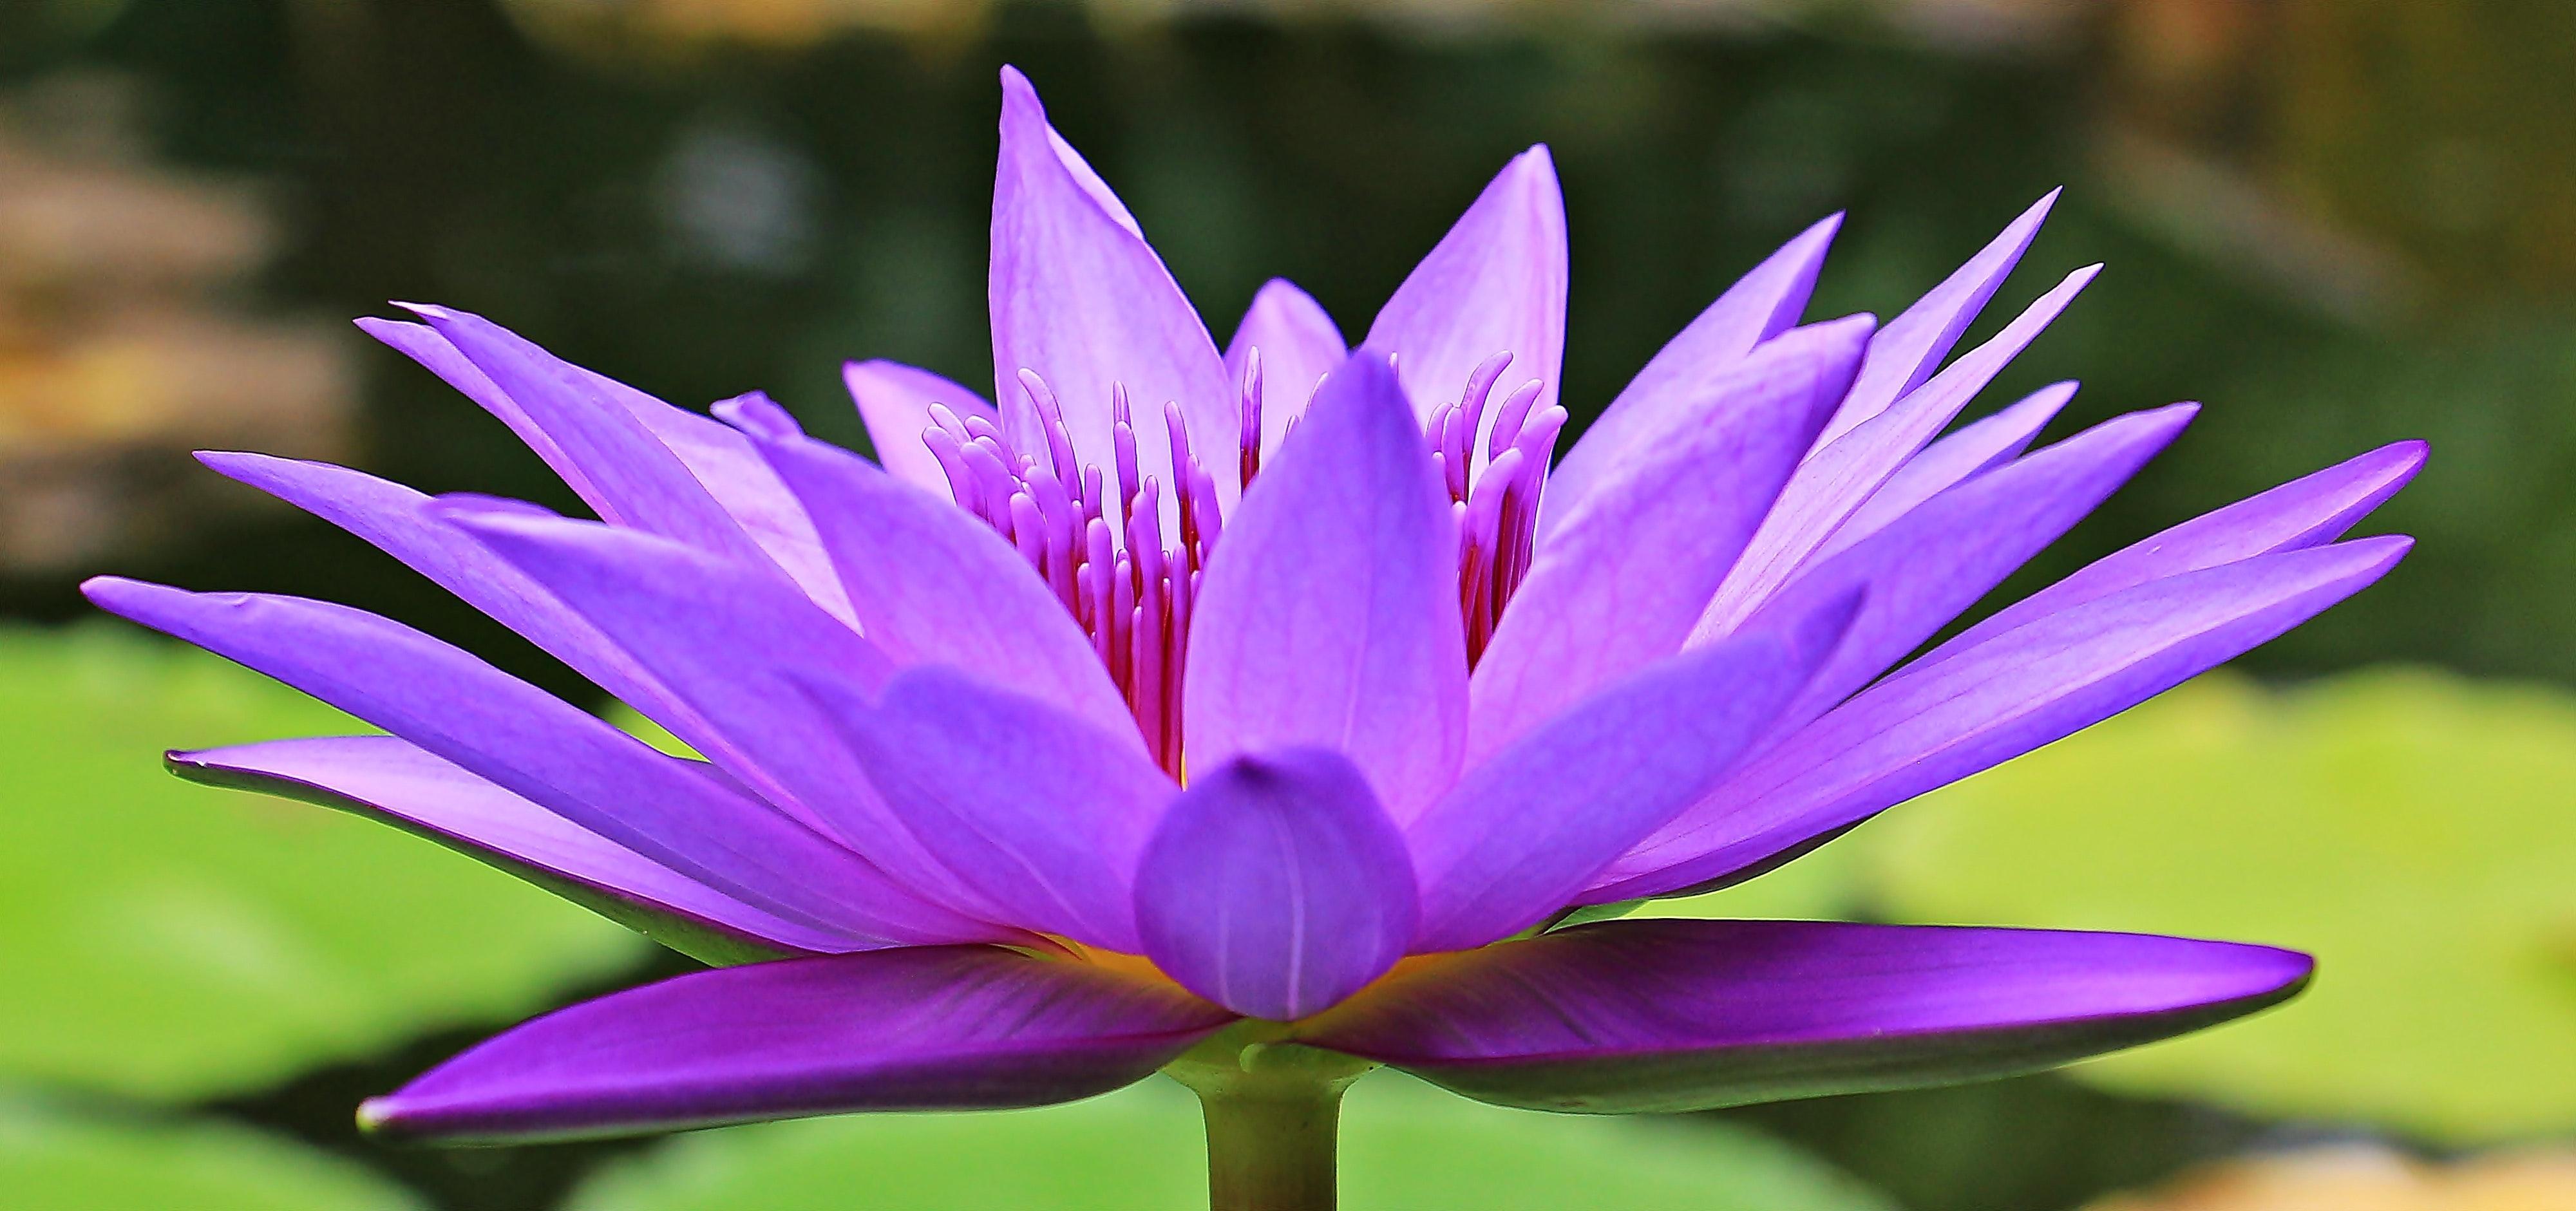 Purple Flower Free Stock Photo